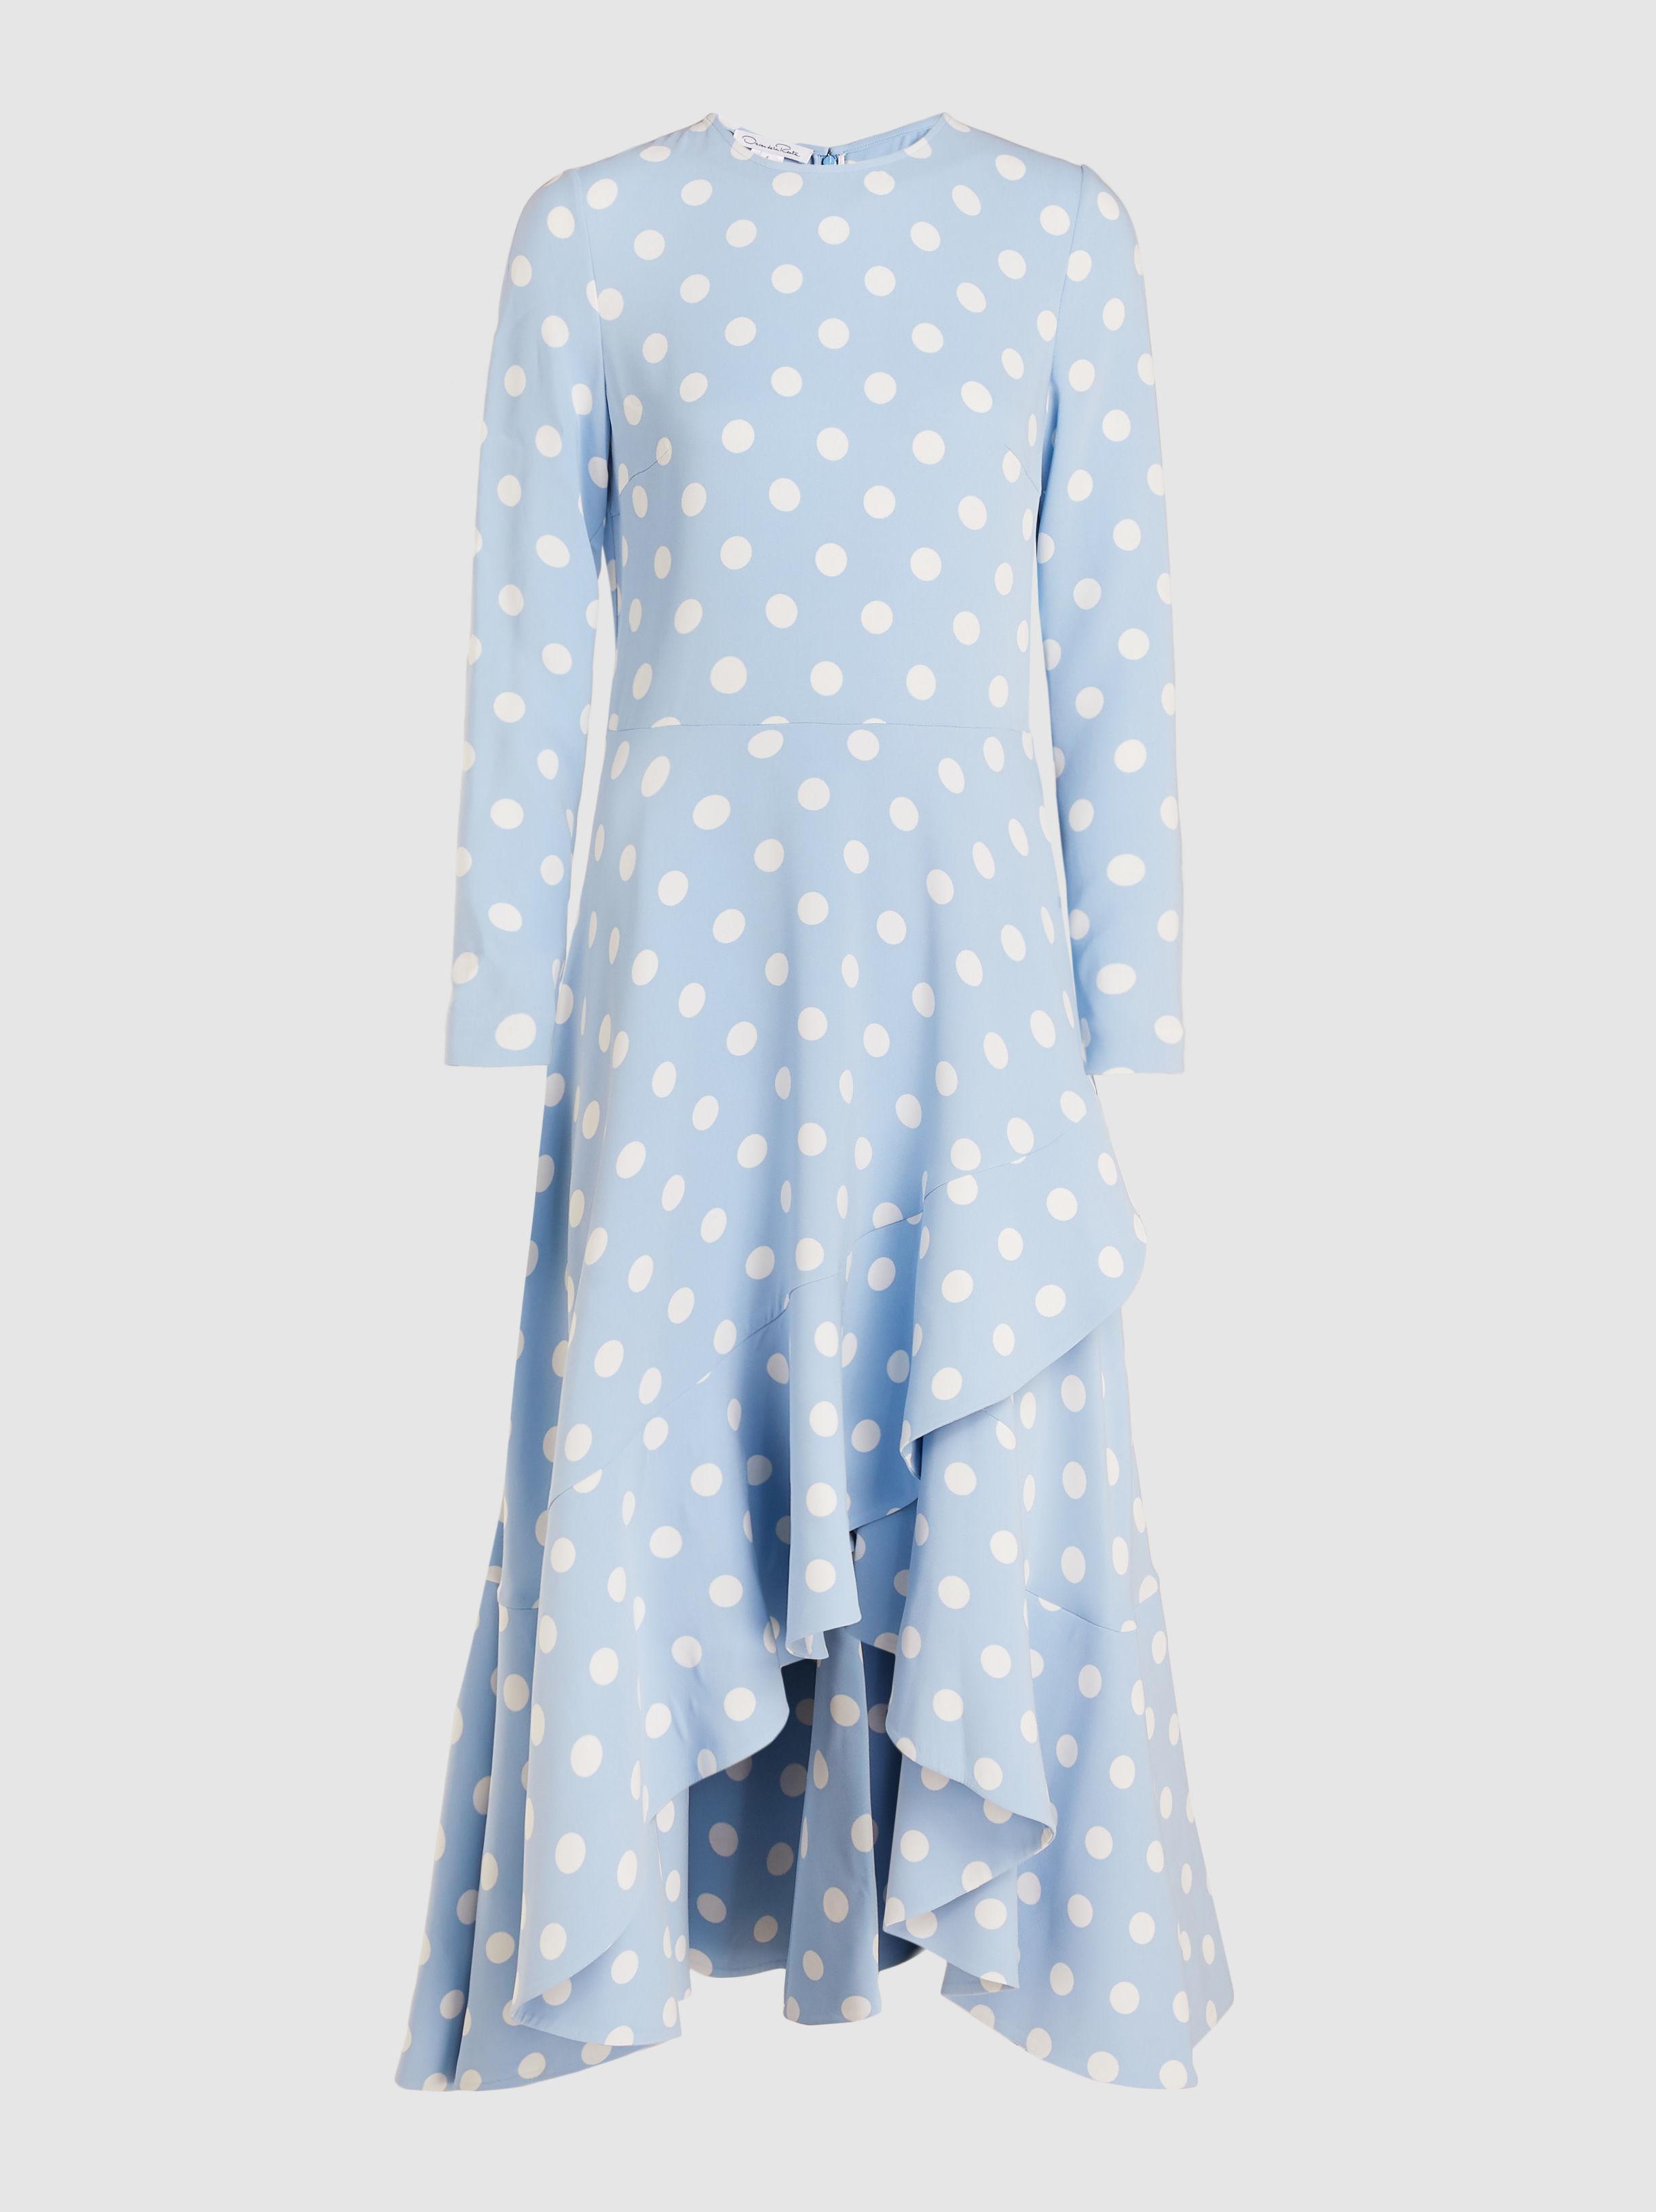 8269d2e1566fc7 Lyst - Oscar de la Renta Polka Dot Dress in Blue - Save 8%